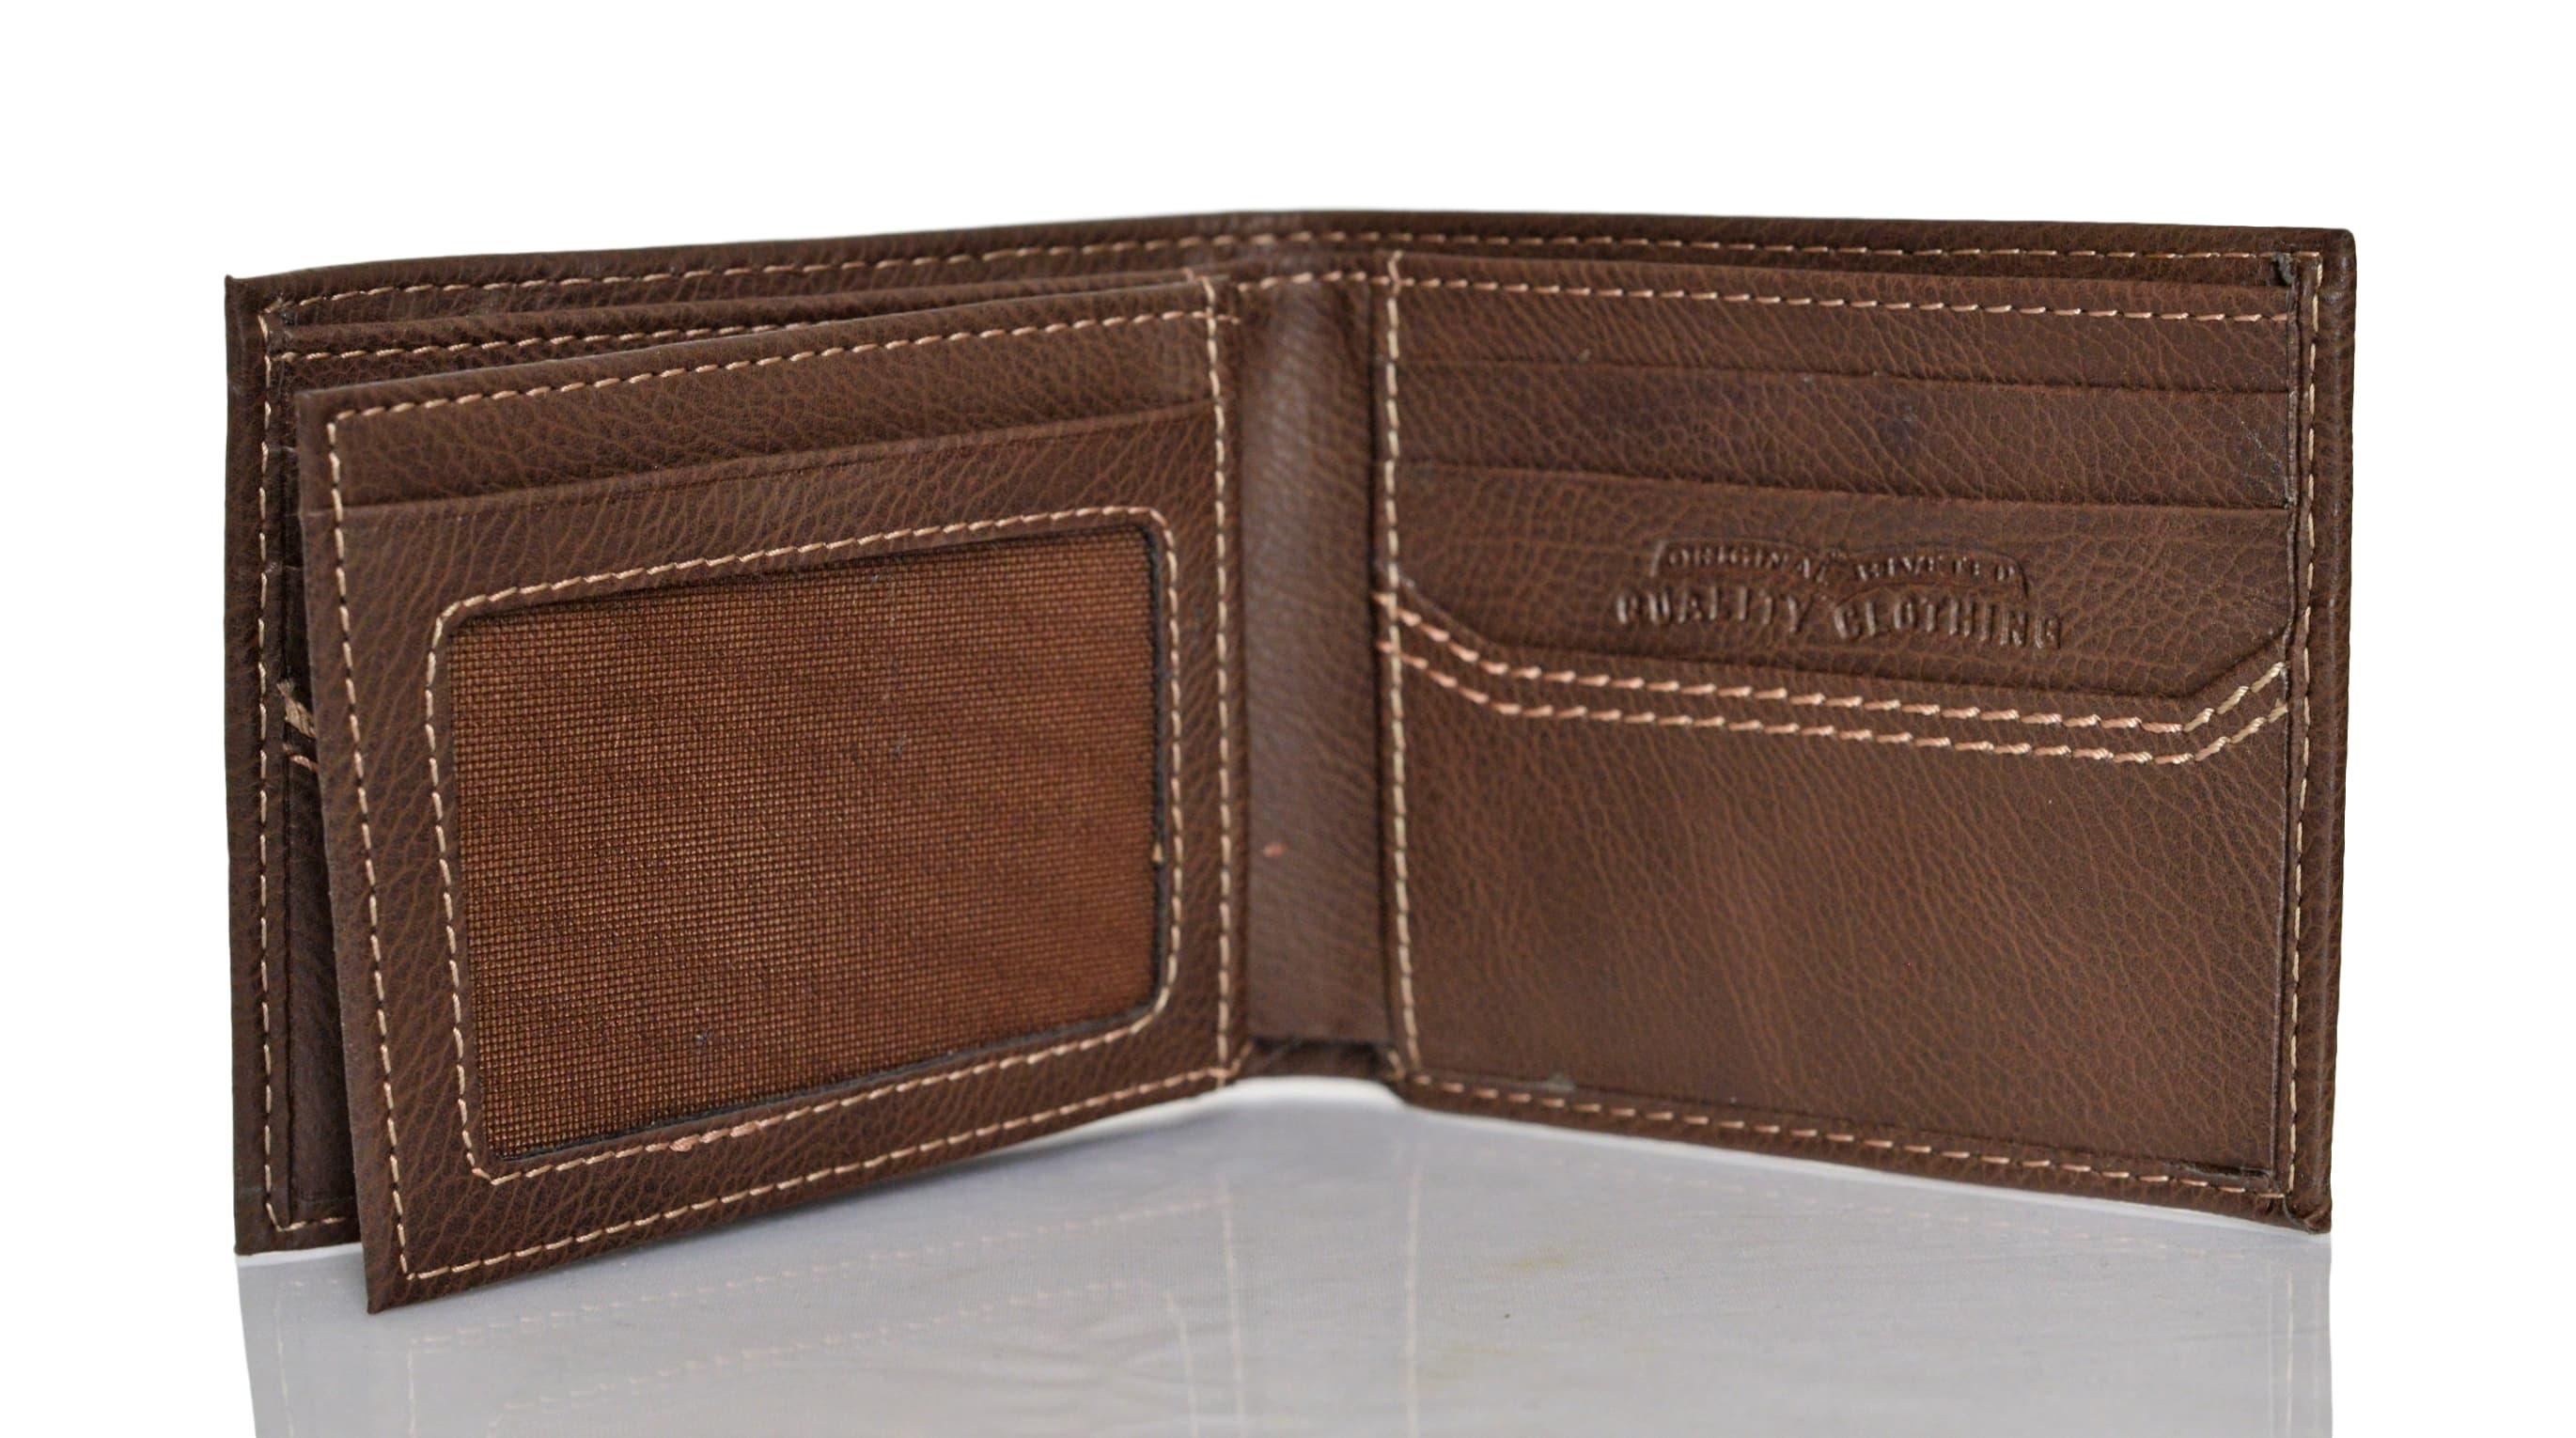 Levi-039-s-X-Capacity-Slim-Men-039-s-Bifold-Leather-Wallet thumbnail 12